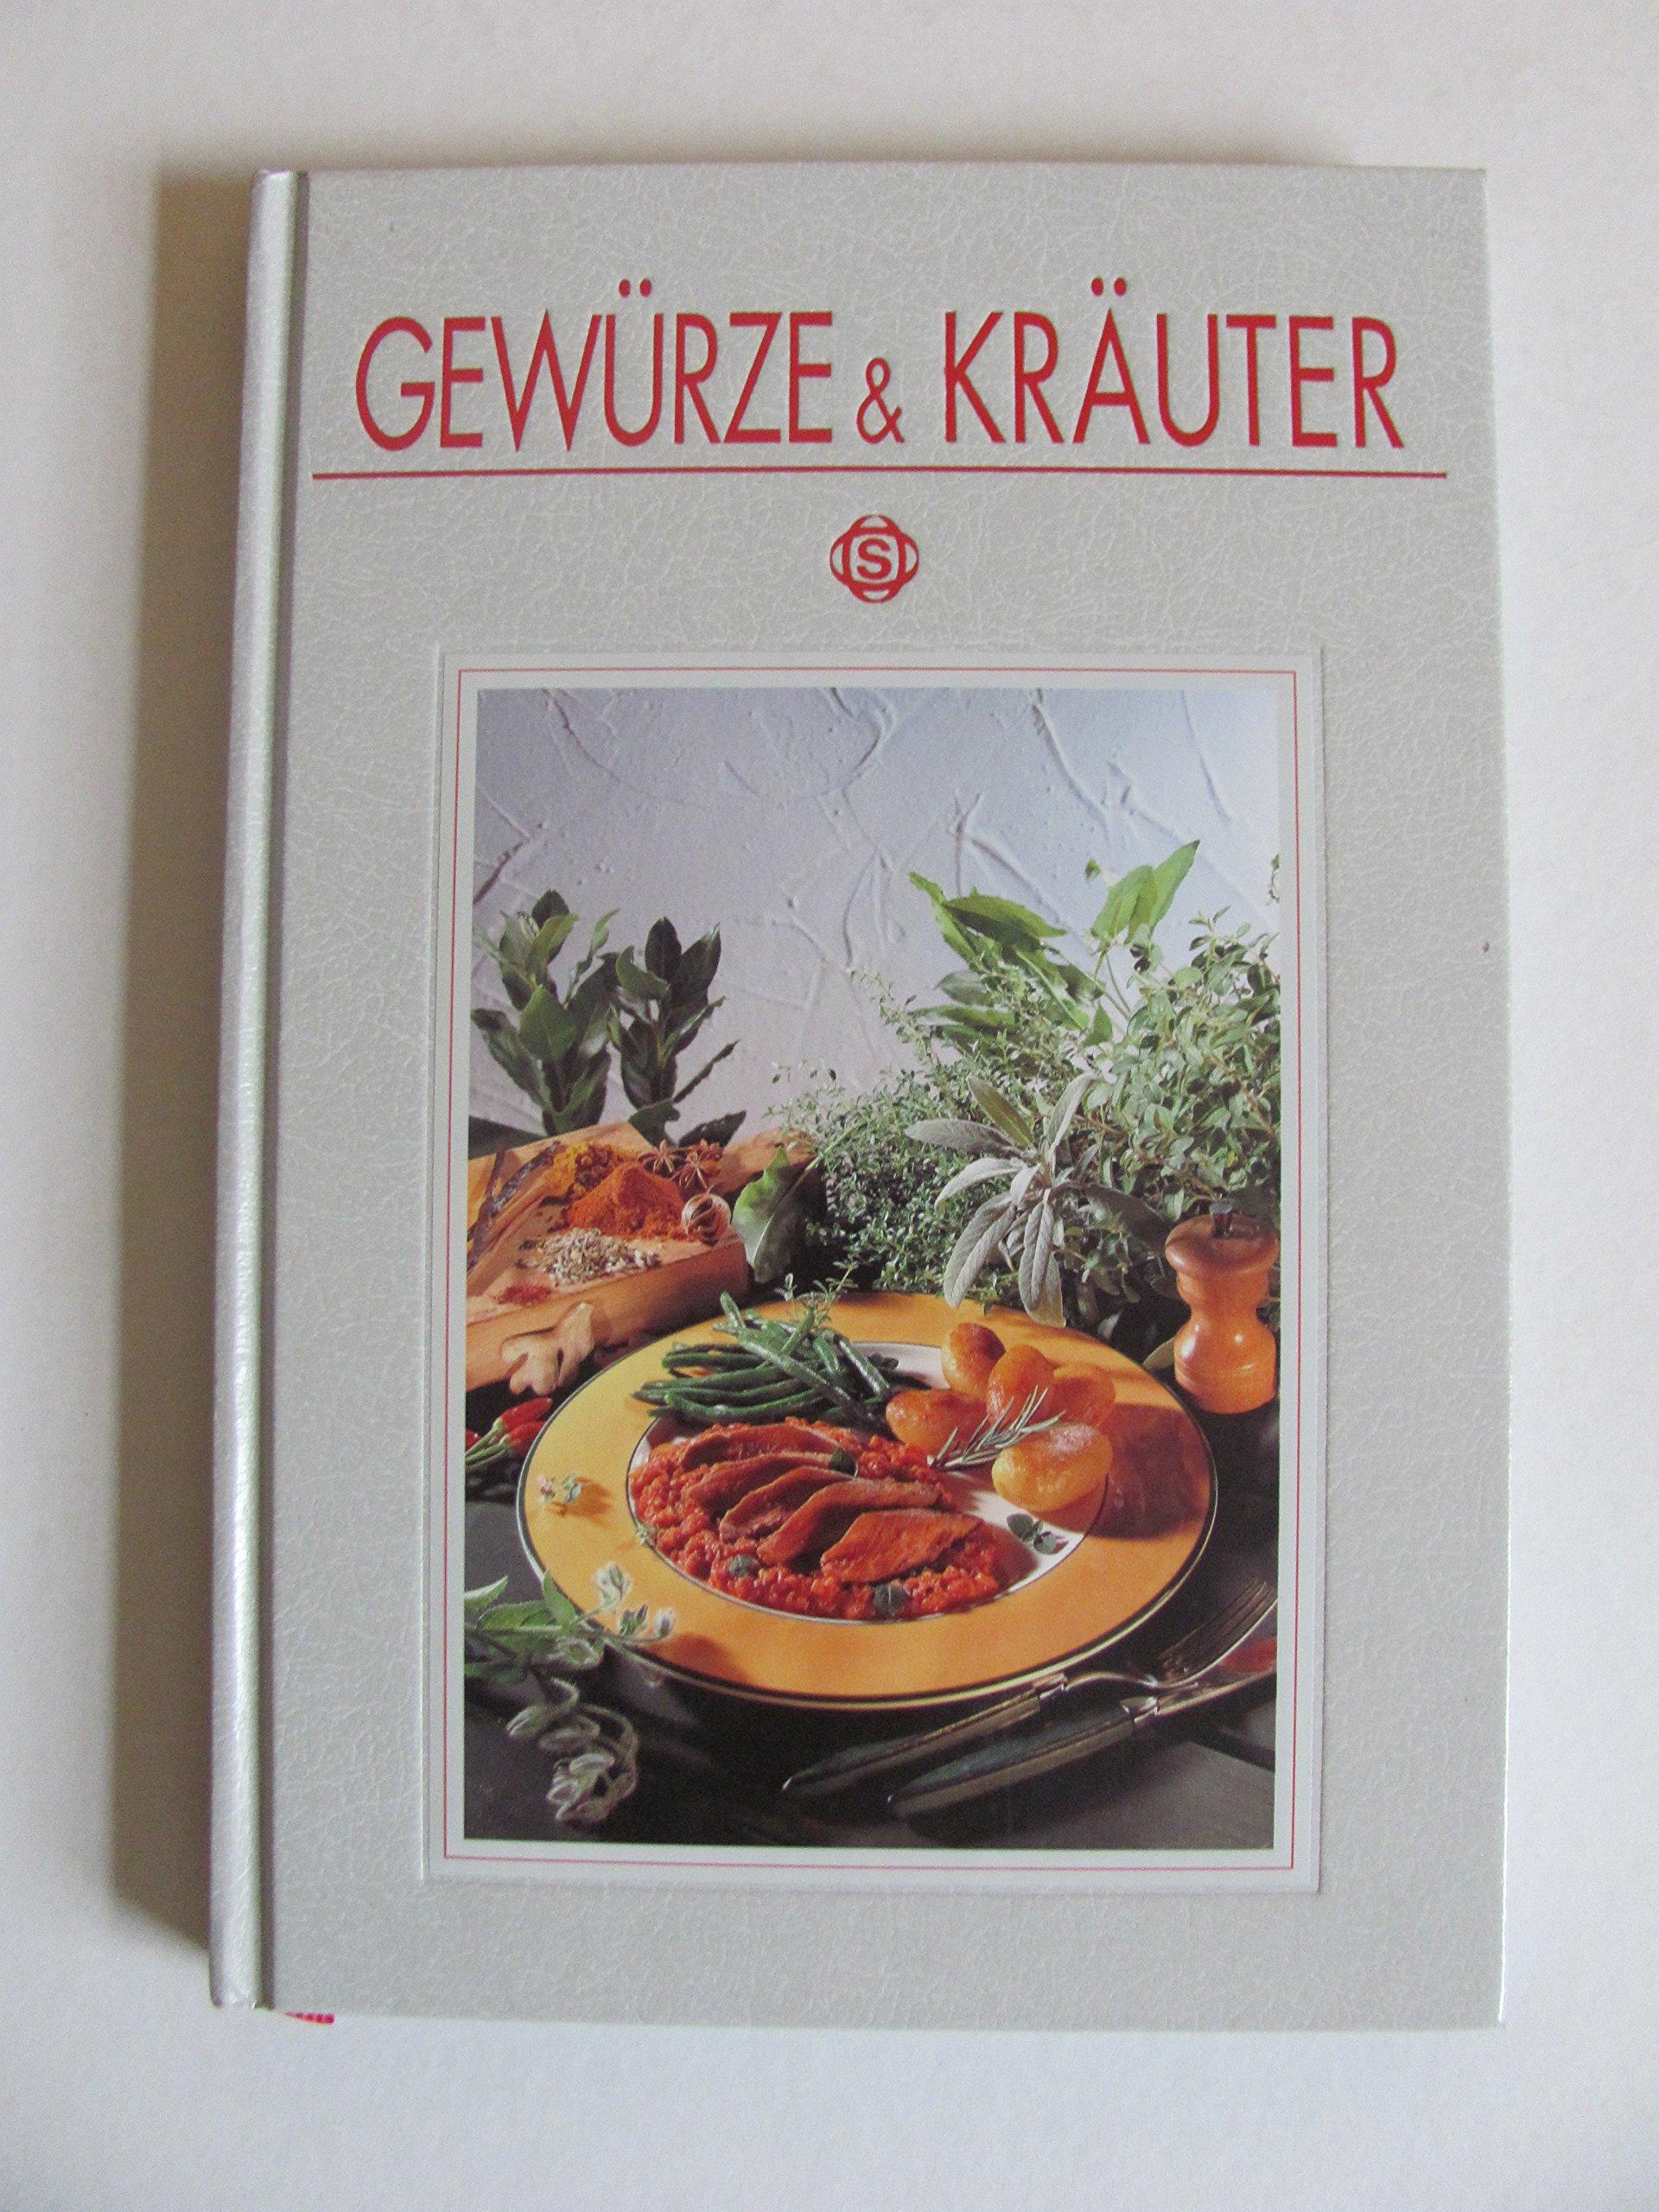 Gewürze & Kräuter